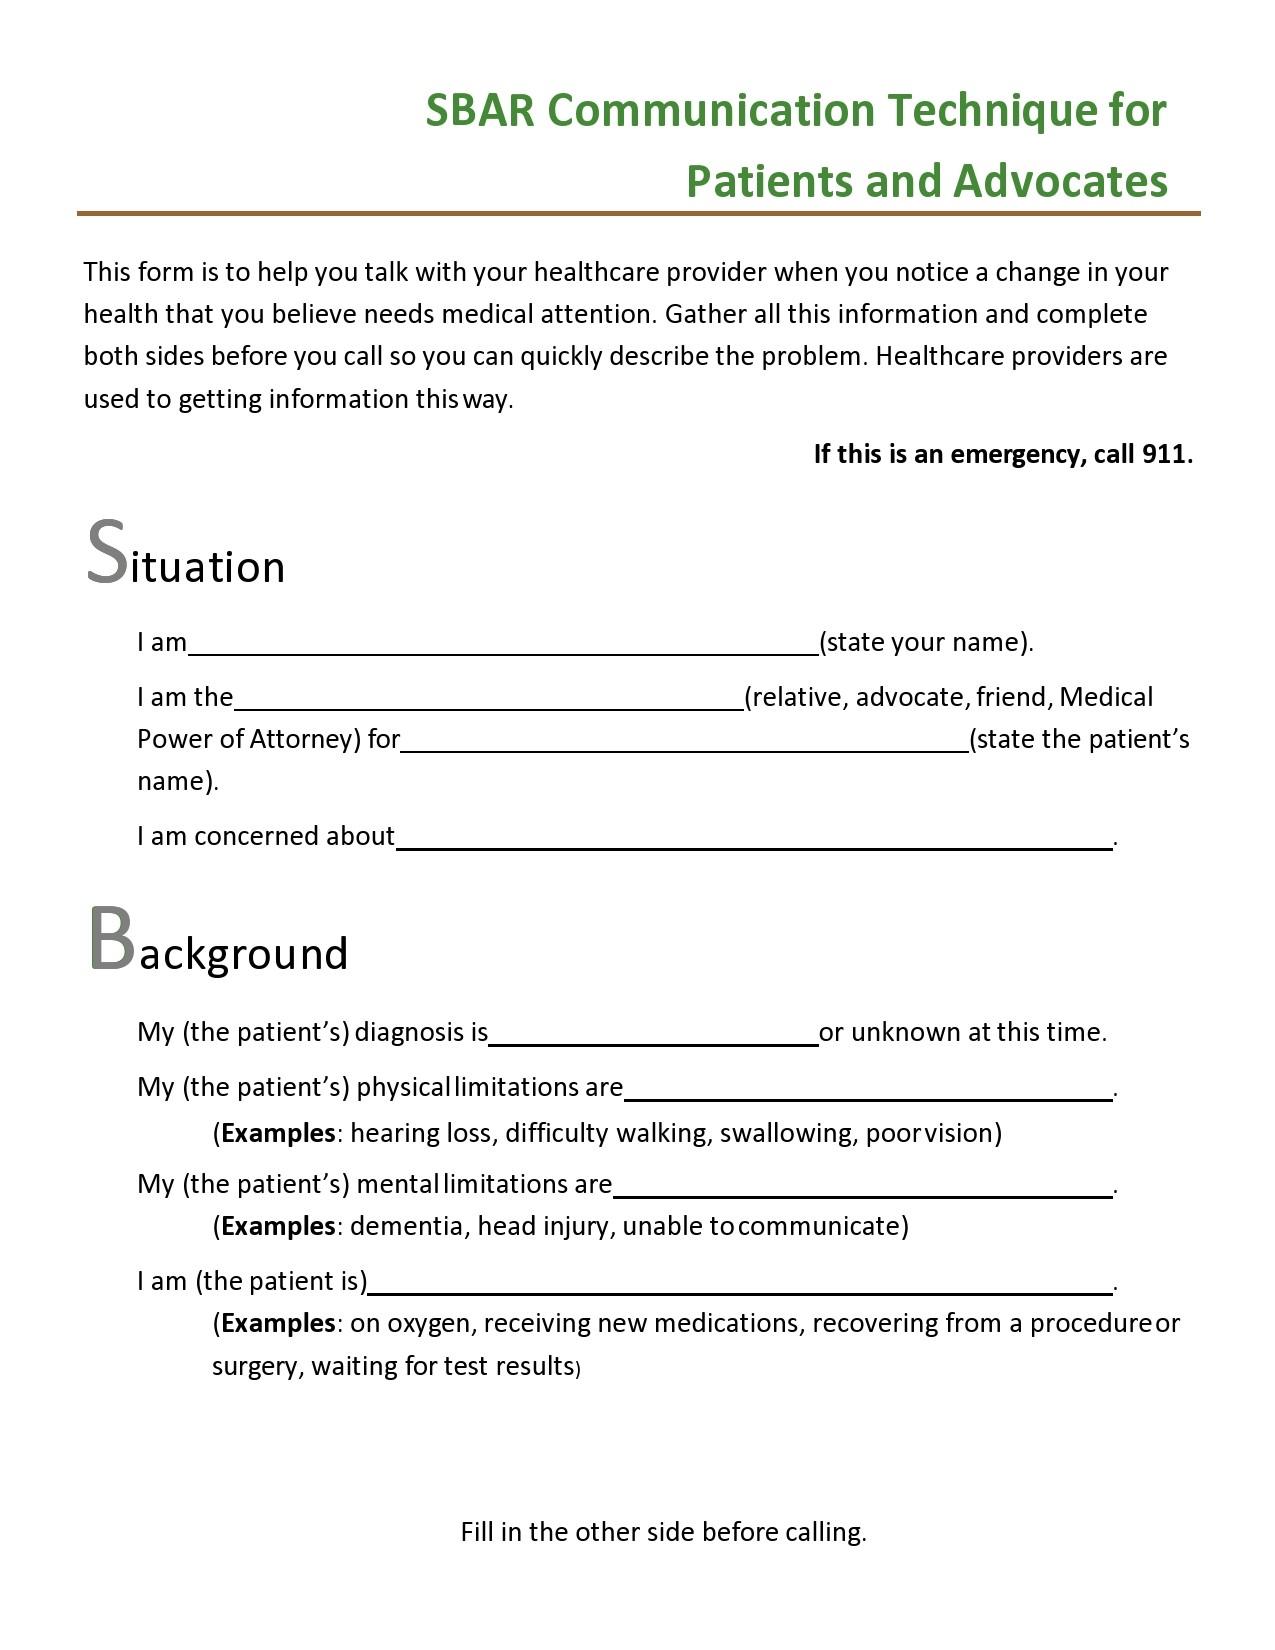 Free sbar template 17